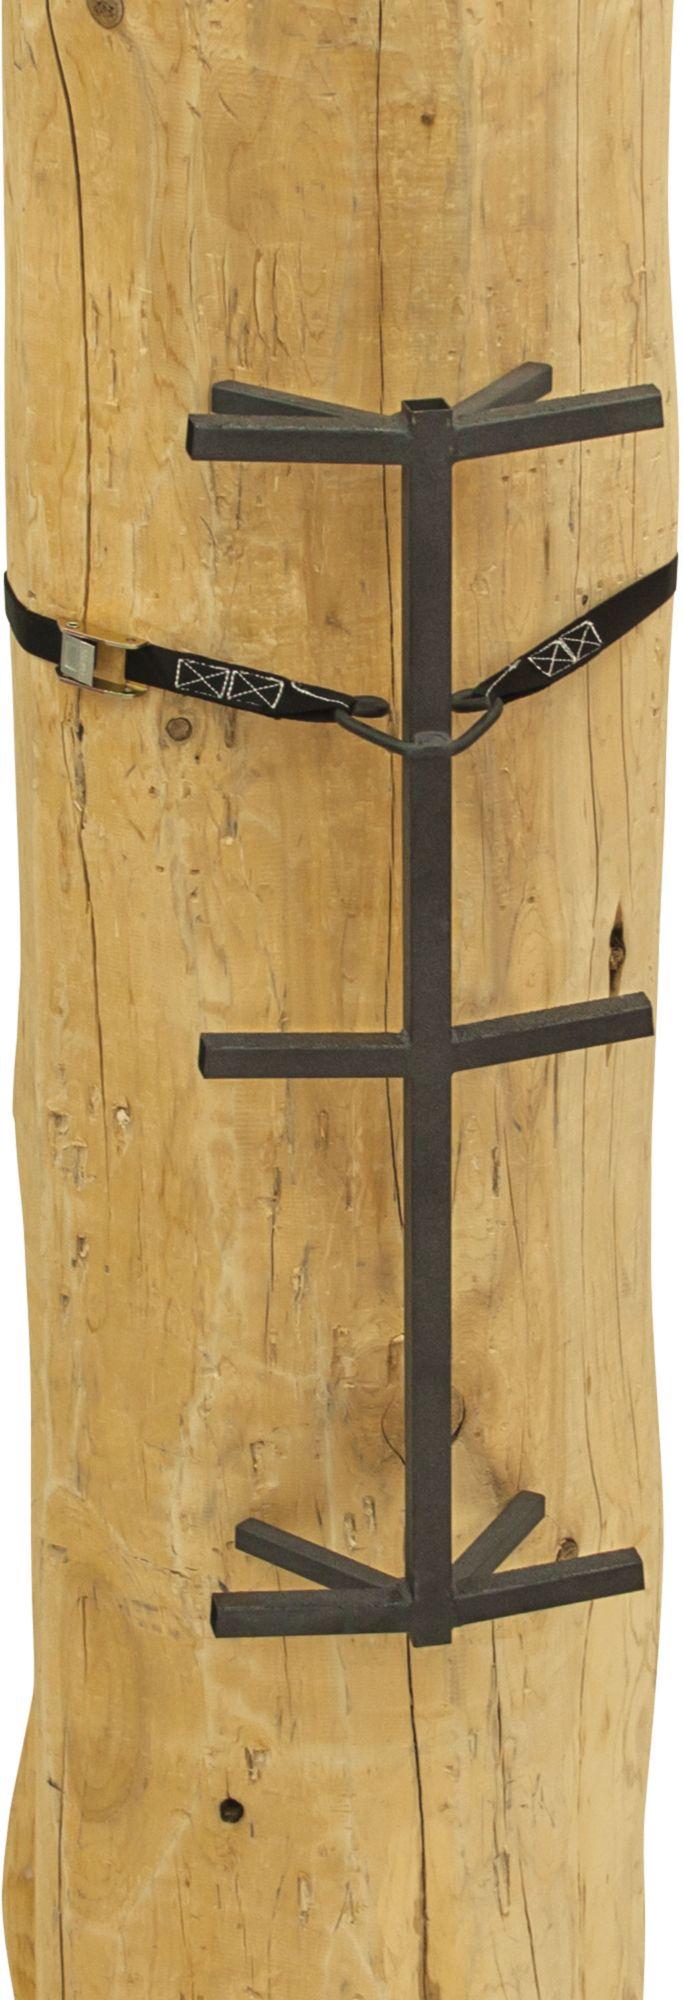 Rivers Edge Grip Stick Climbing Sticks - 3 Pack, Adult Unisex, Size: One size thumbnail